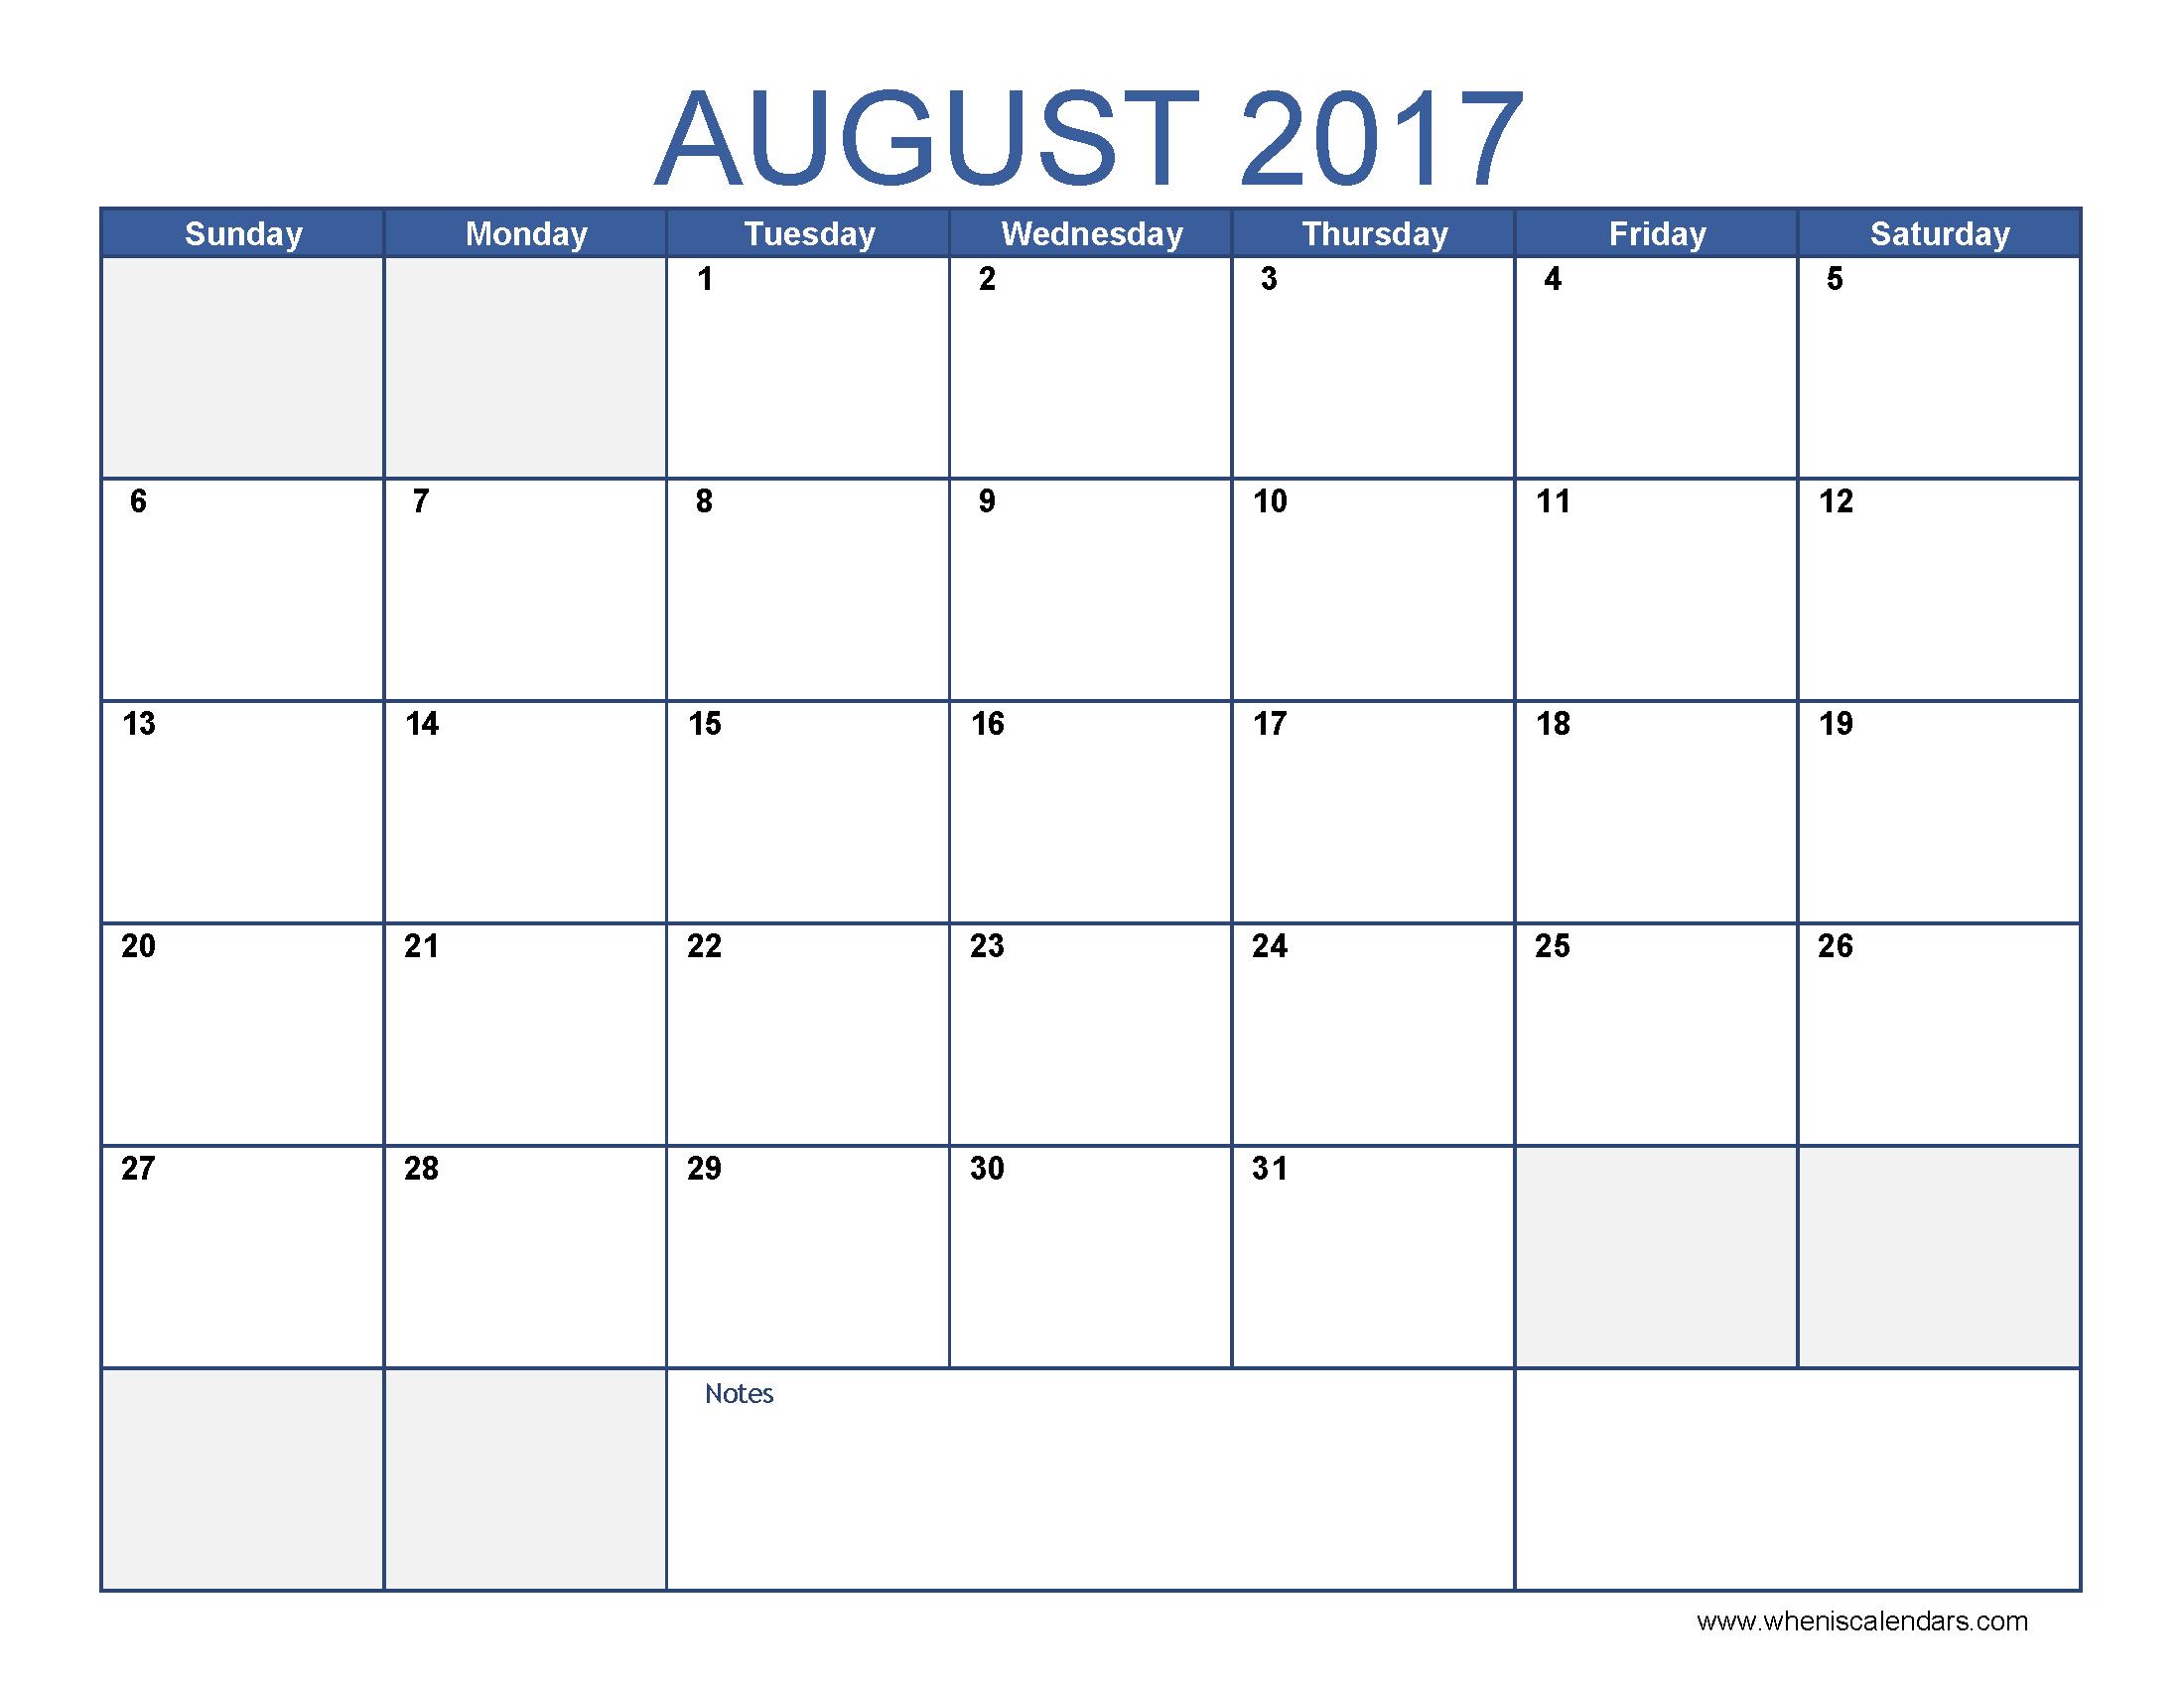 August 2017 Calendar Template | blank calendar printable